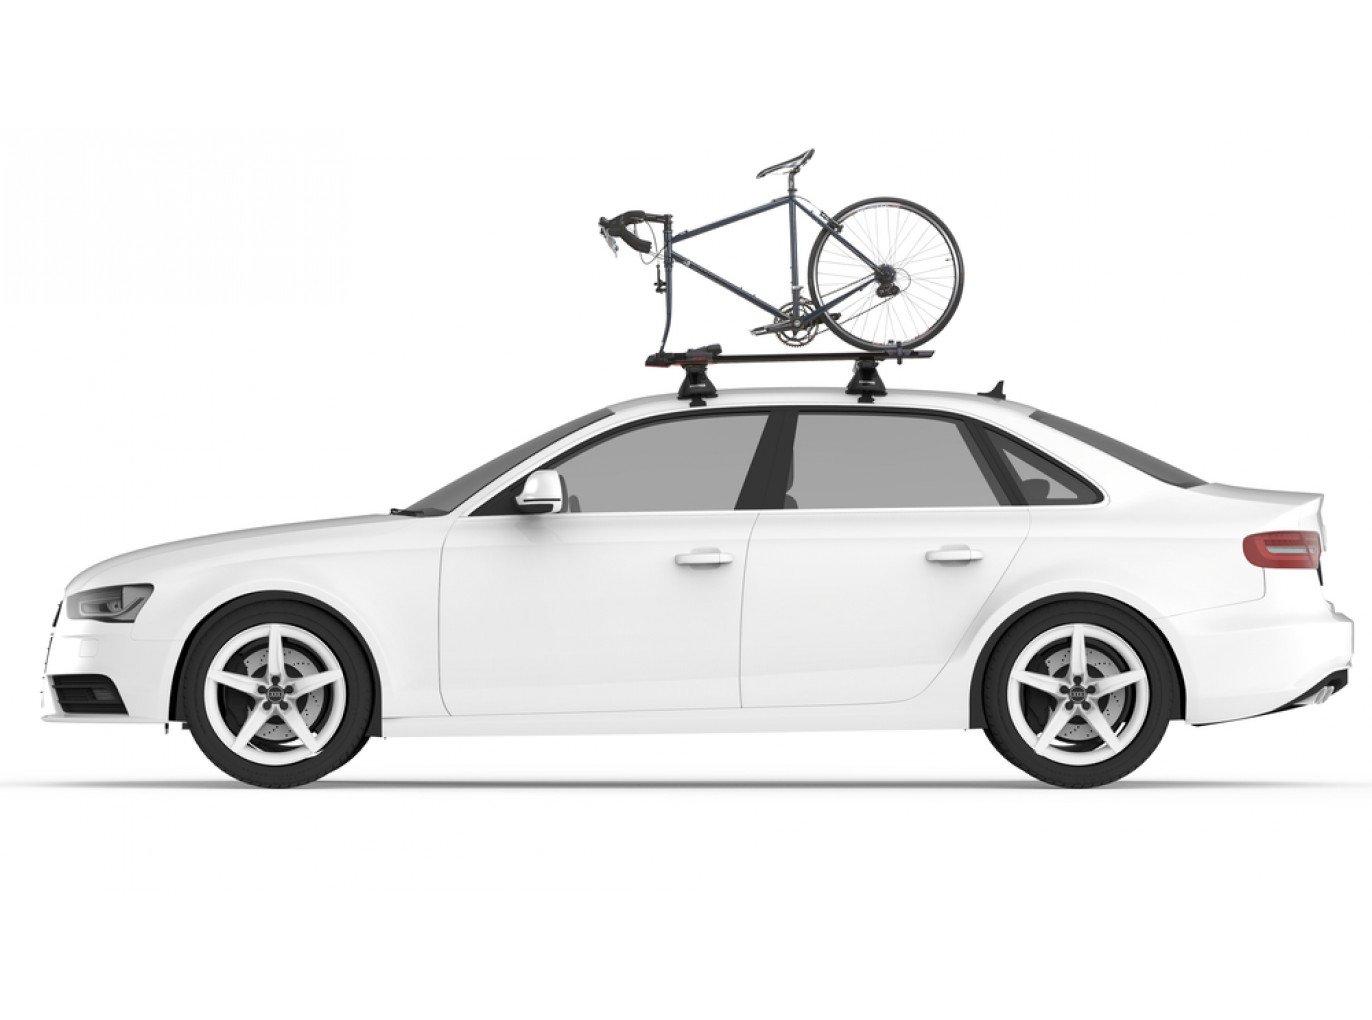 Yakima HighSpeed Premium Rooftop Fork Bike Mount